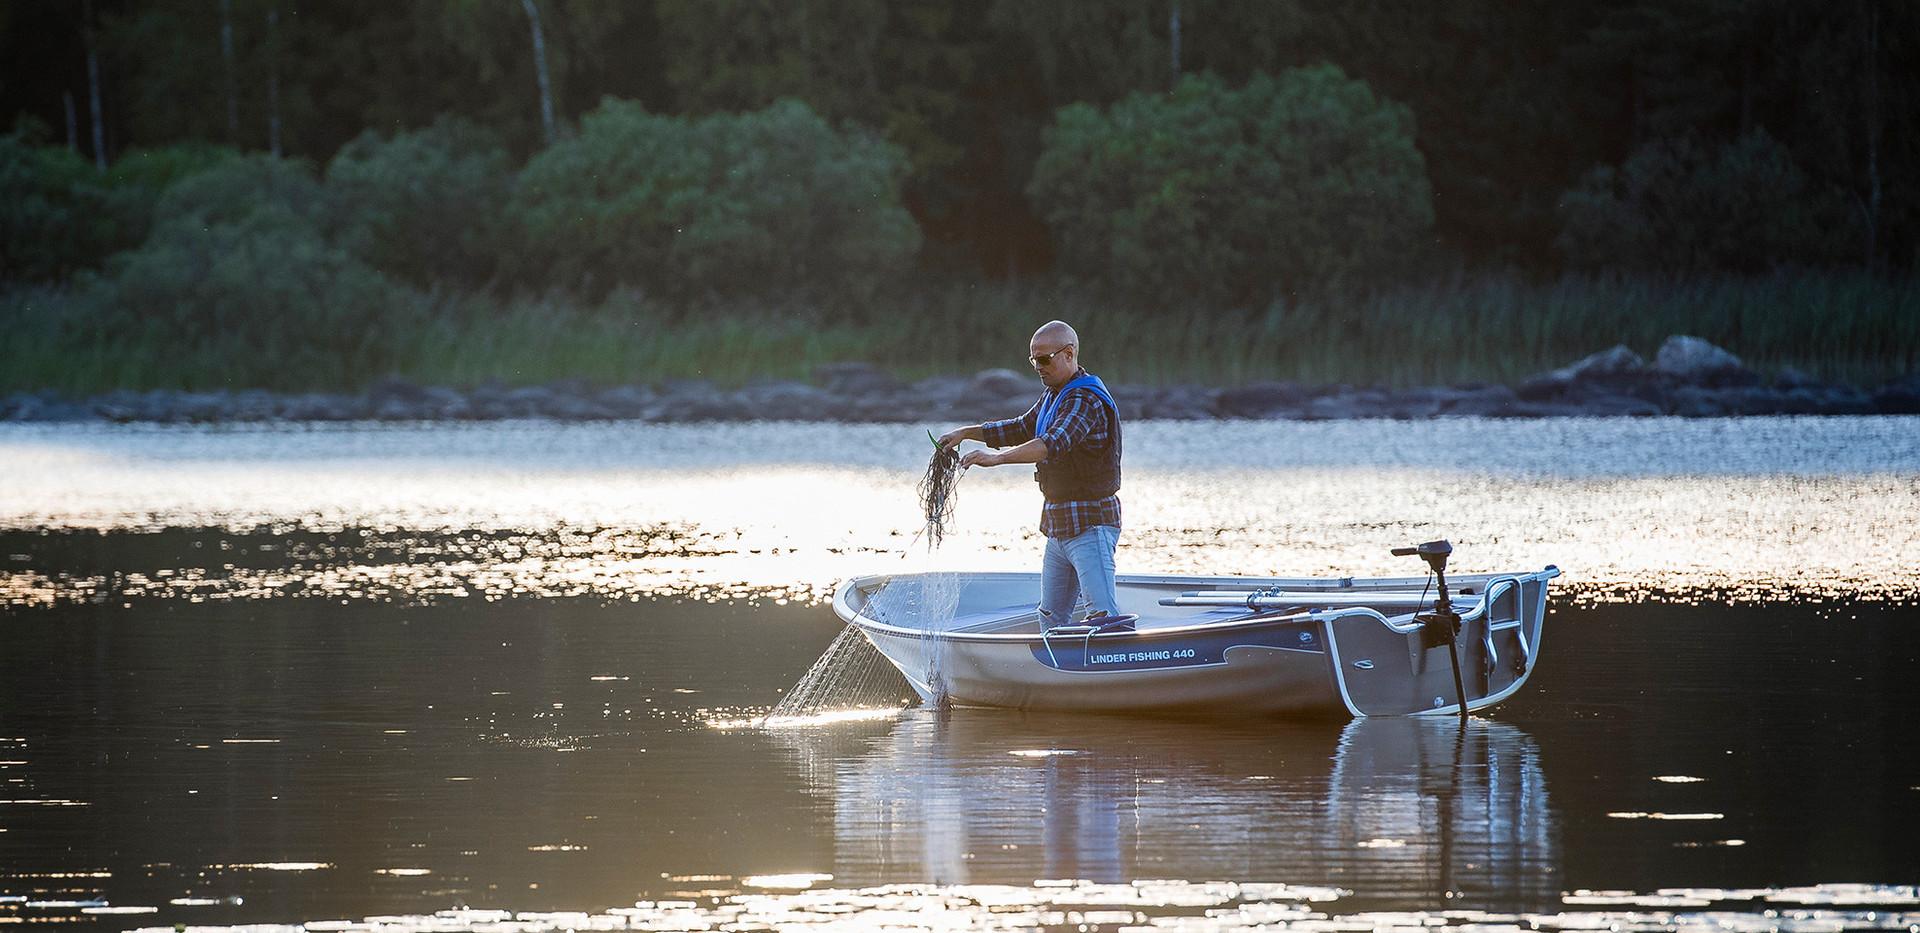 Linder 440 Fishing Boat